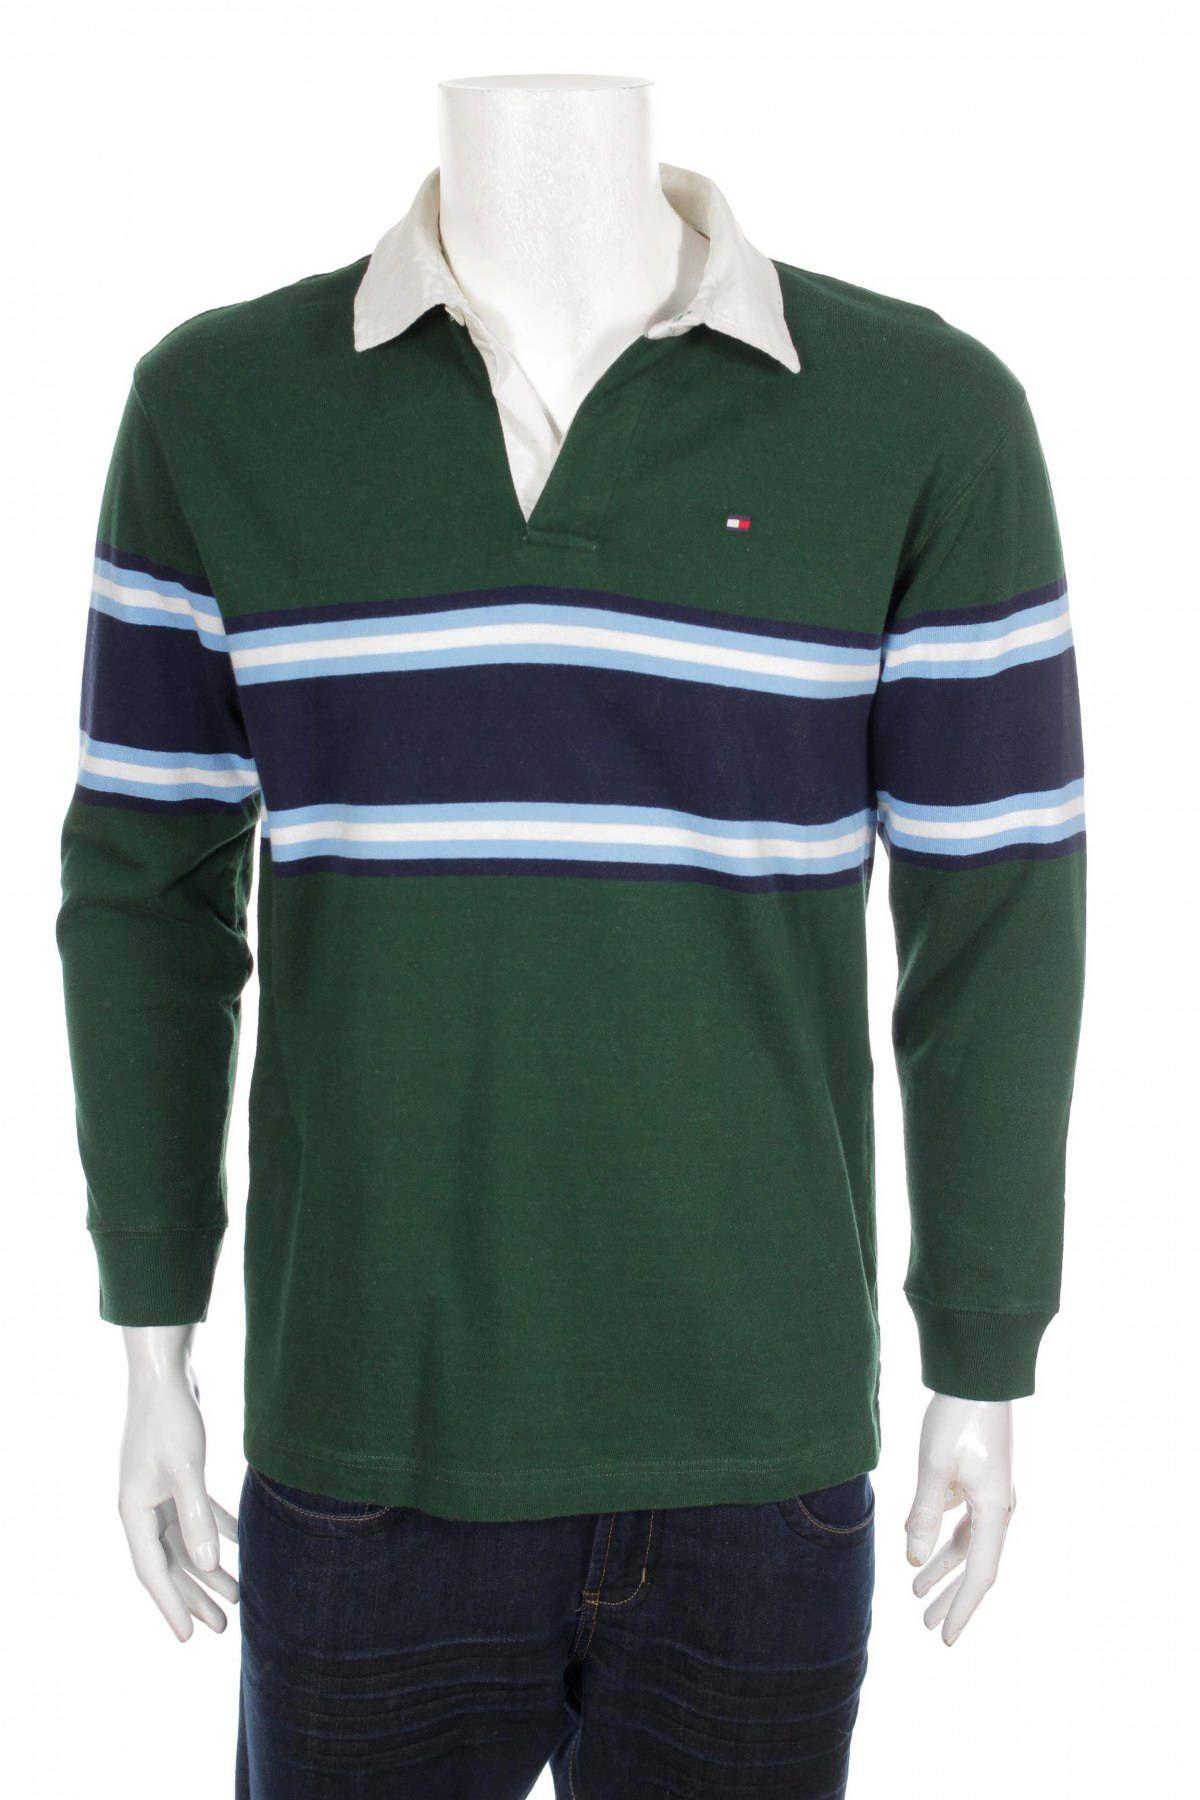 e34db340 Vintage TOMMY HILFIGER Polo Shirt / Color Block/ Green/White/Blue/ Size XL  by VapeoVintage on Etsy